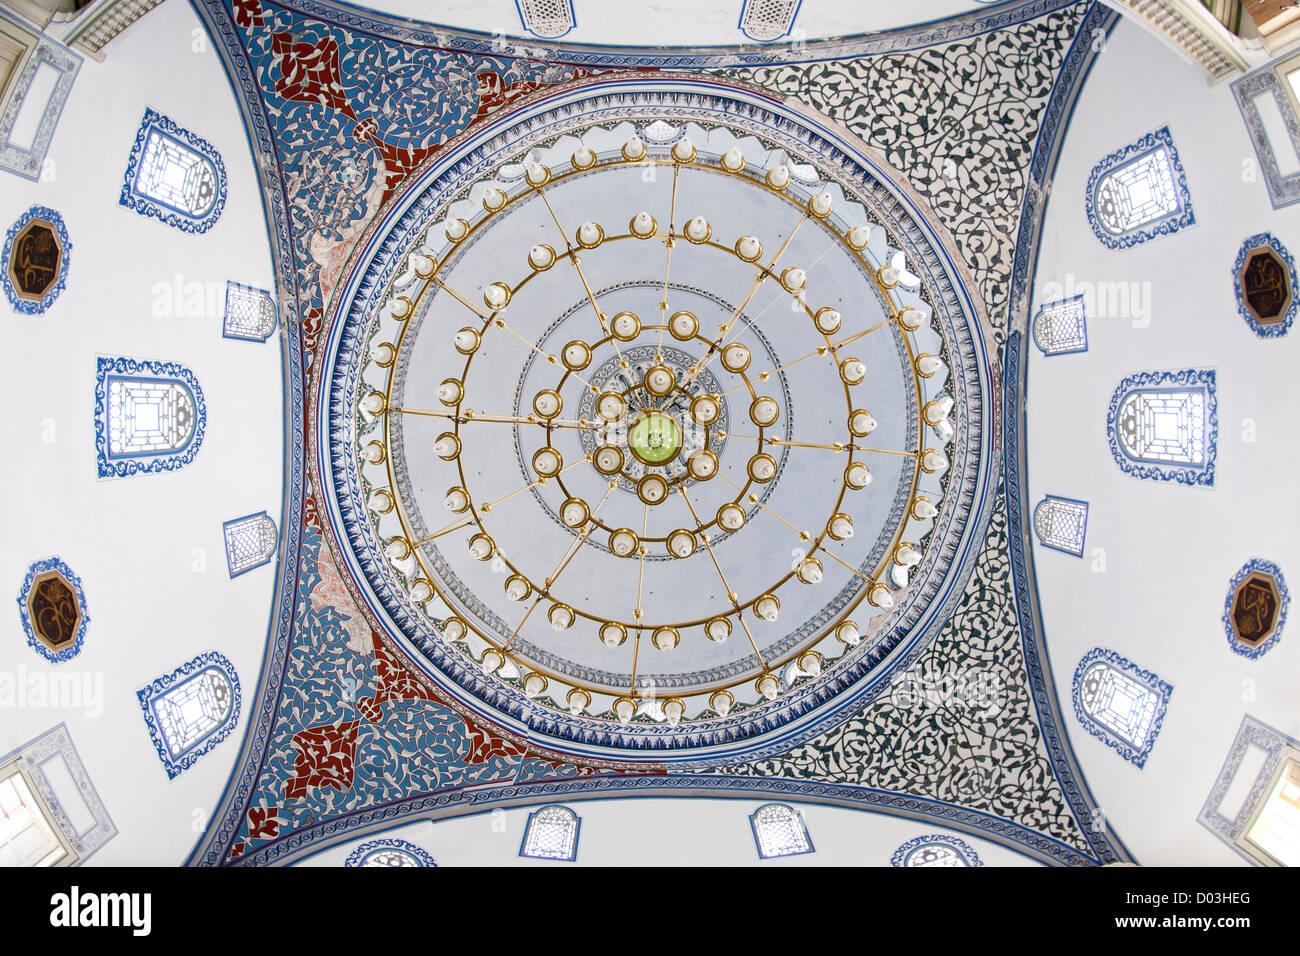 Ceiling of the Mustafa Pasha mosque in Skopje, the capital of Macedonia. - Stock Image